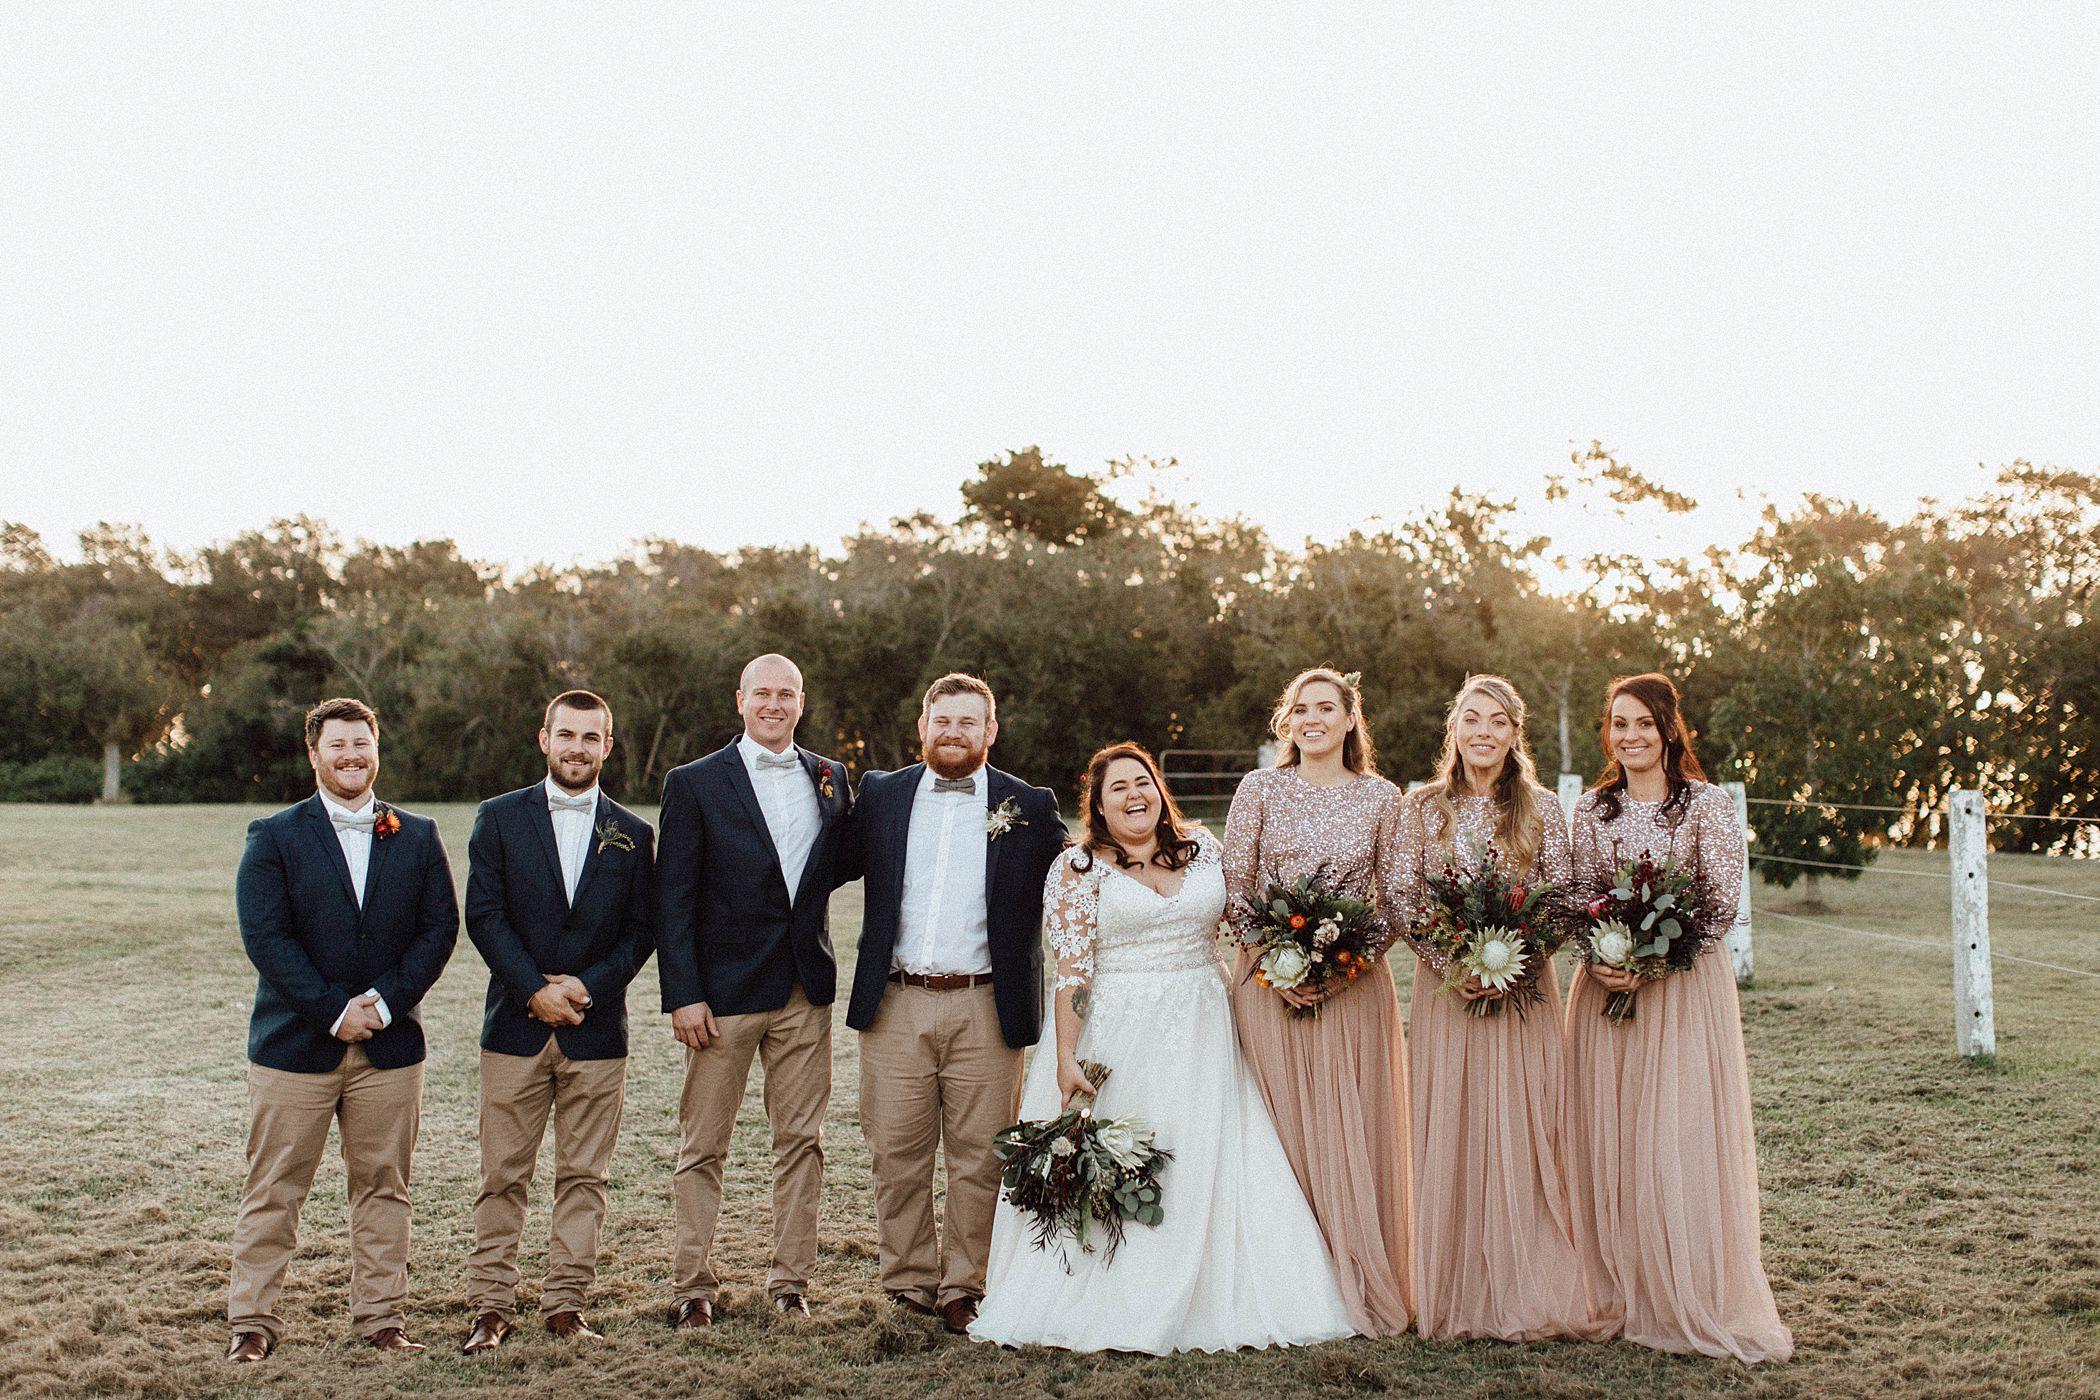 lauren-anne-photography-newcastle-hunter-valley-wedding-photographer_1217.jpg